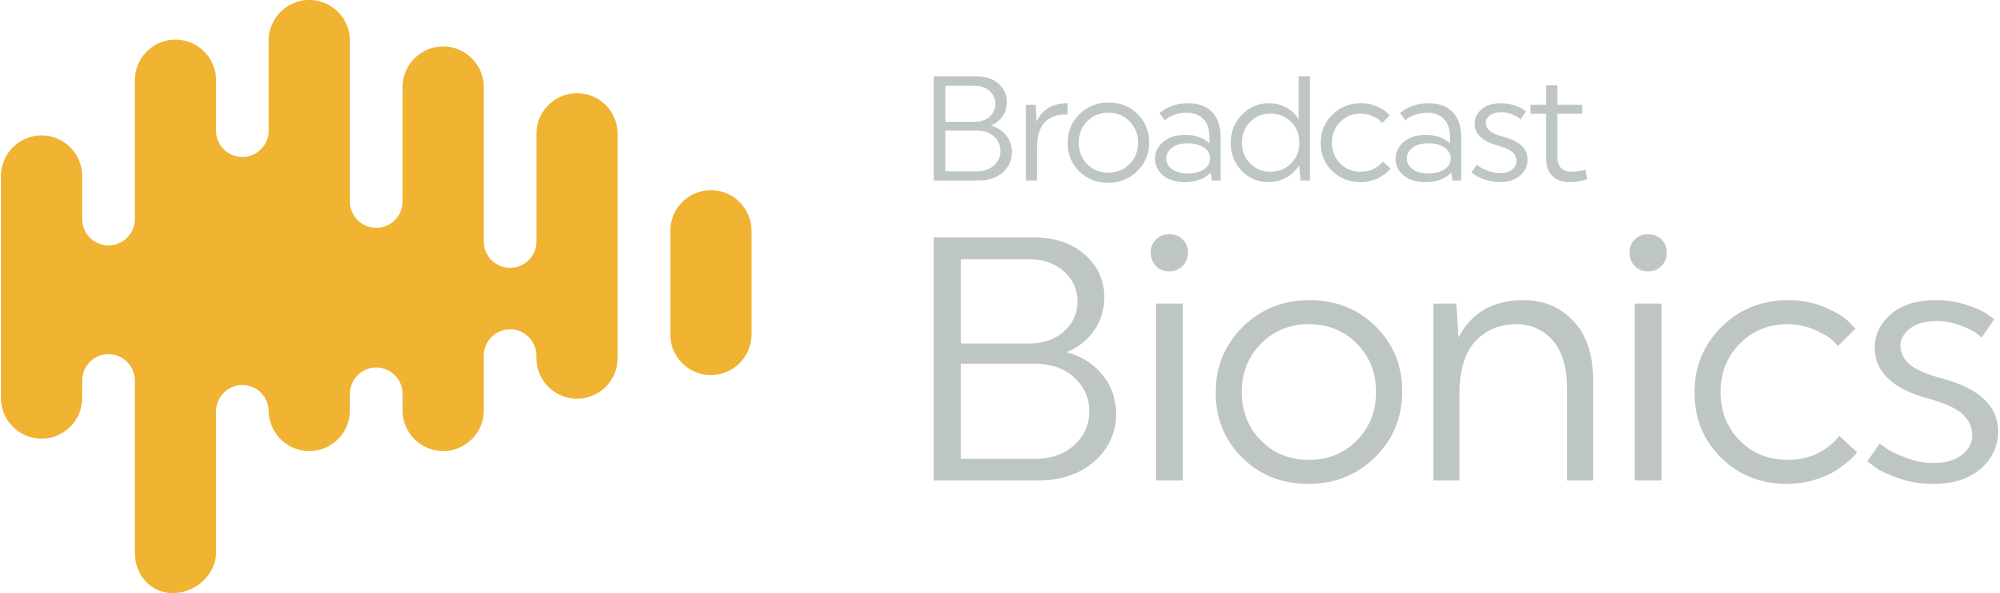 Broadcast Bionics logo